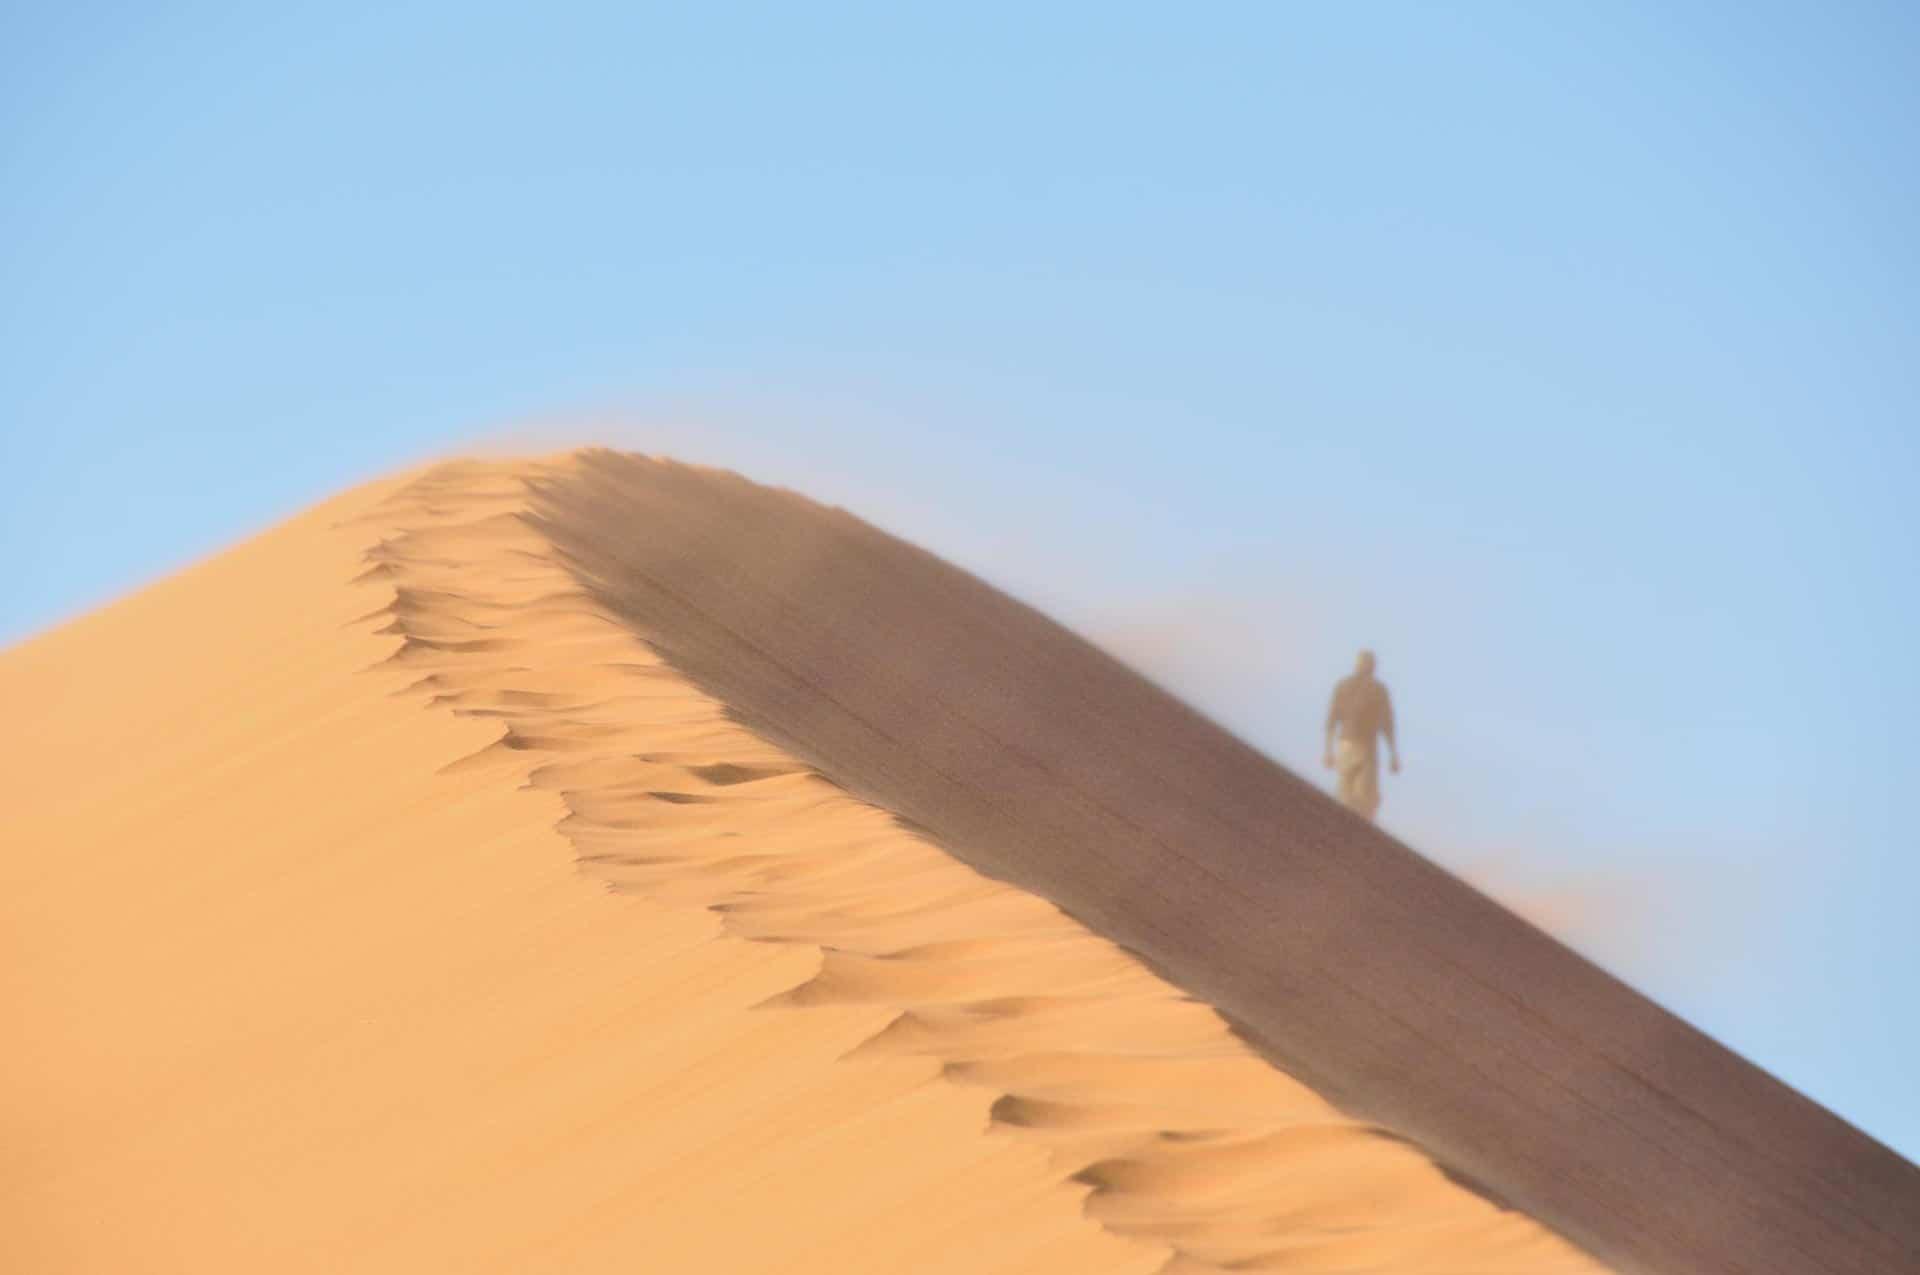 Sossuvlei-Wueste-Namib-Namibia-Globetrotter-Select-15